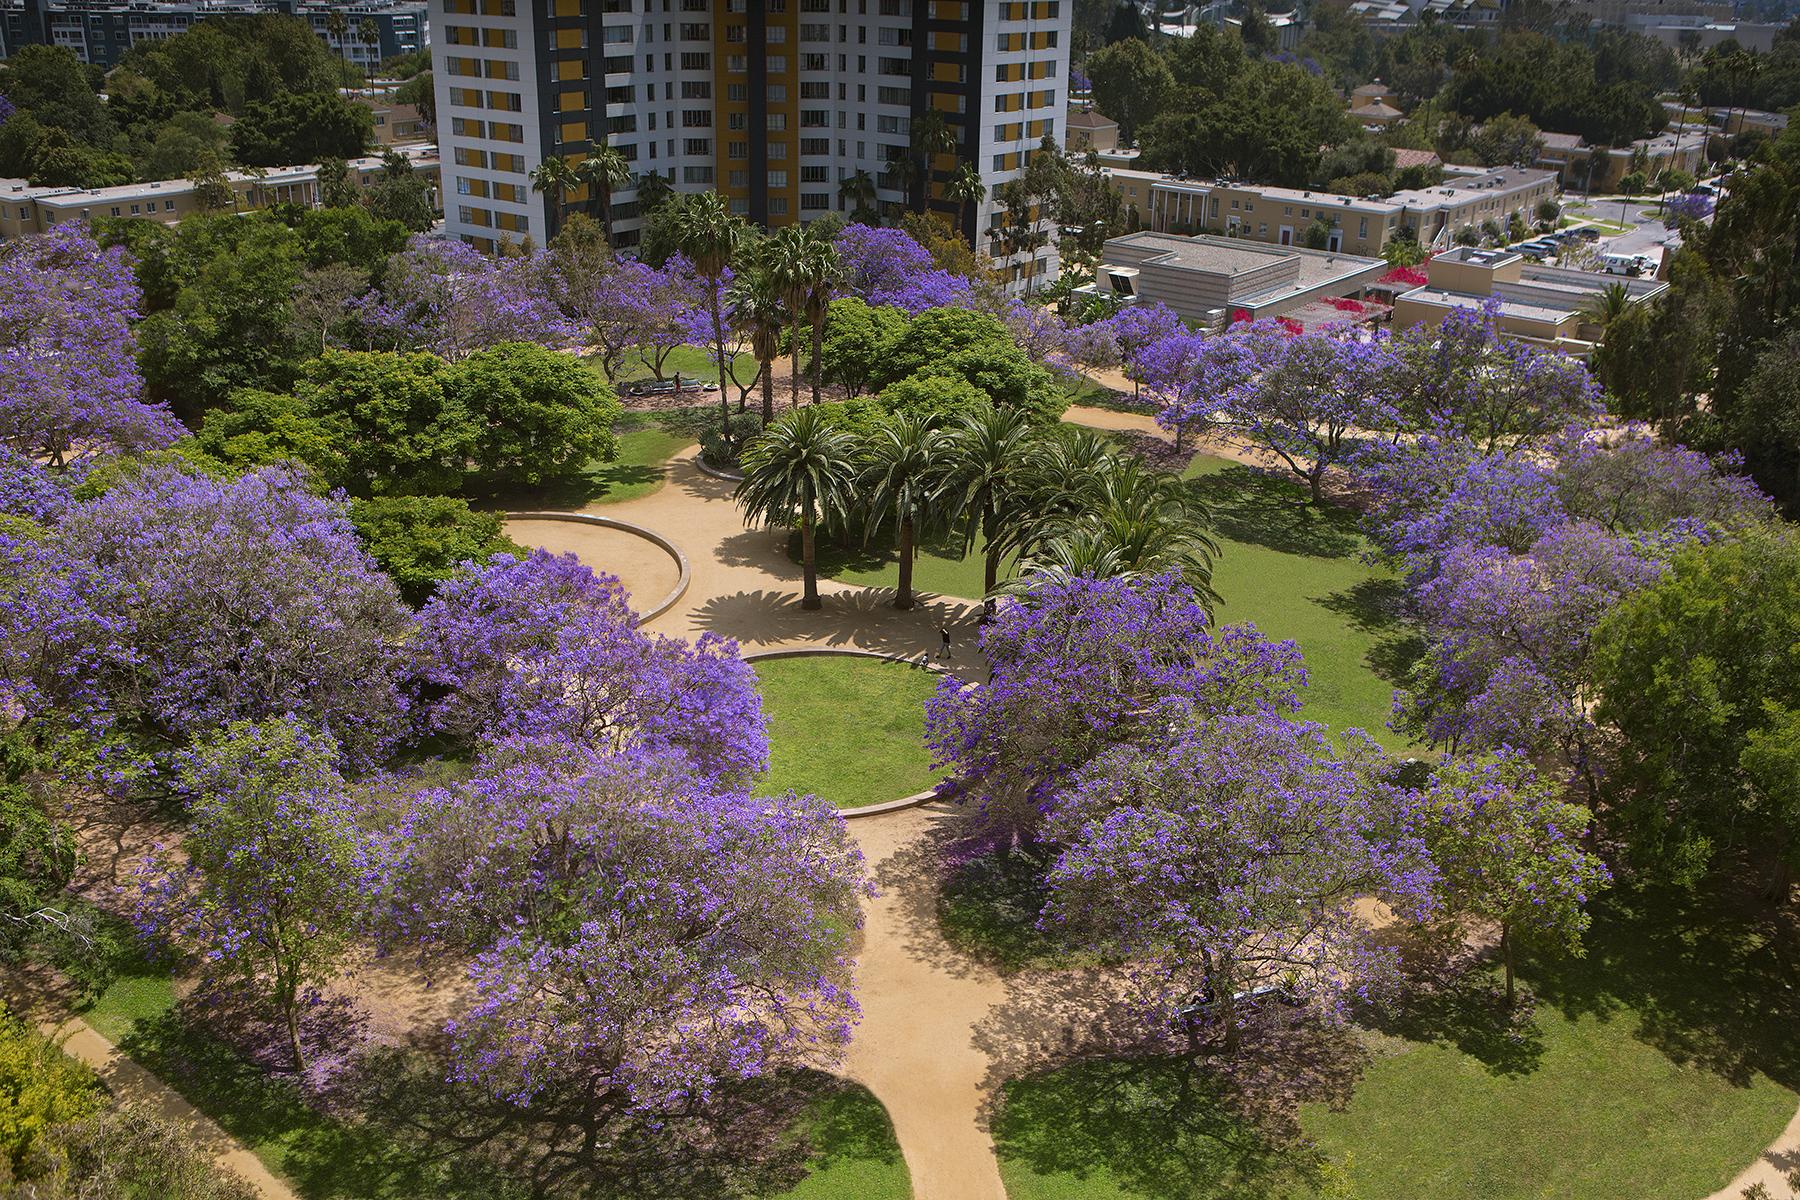 1627-01-Jacaranda-Trees_Park-LaBrea_EricFiggePhotos.jpg